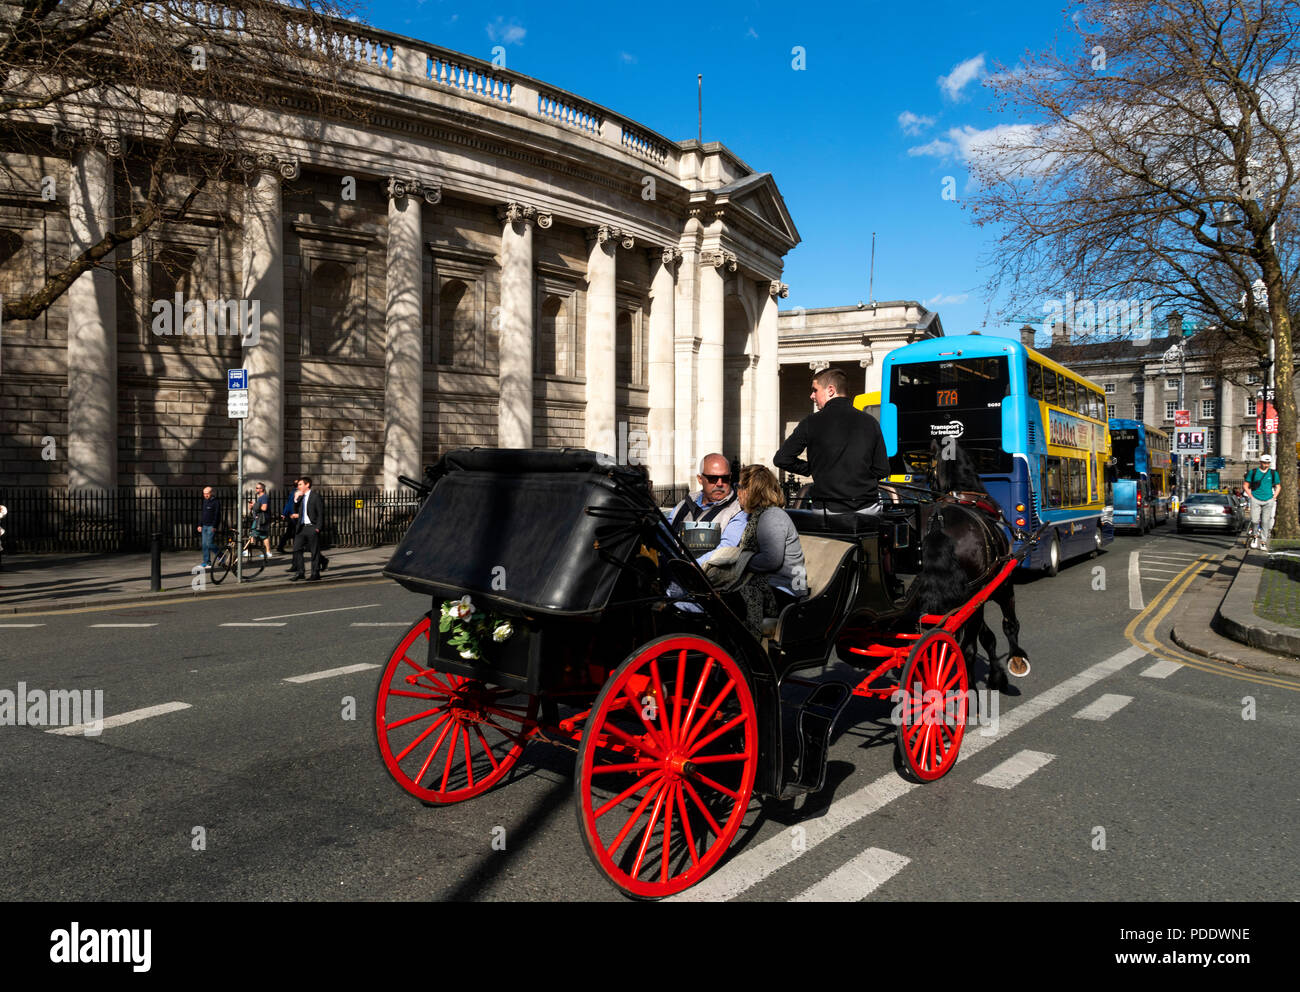 Bank of Ireland & Trinity College, Dublin, Ireland - Stock Image